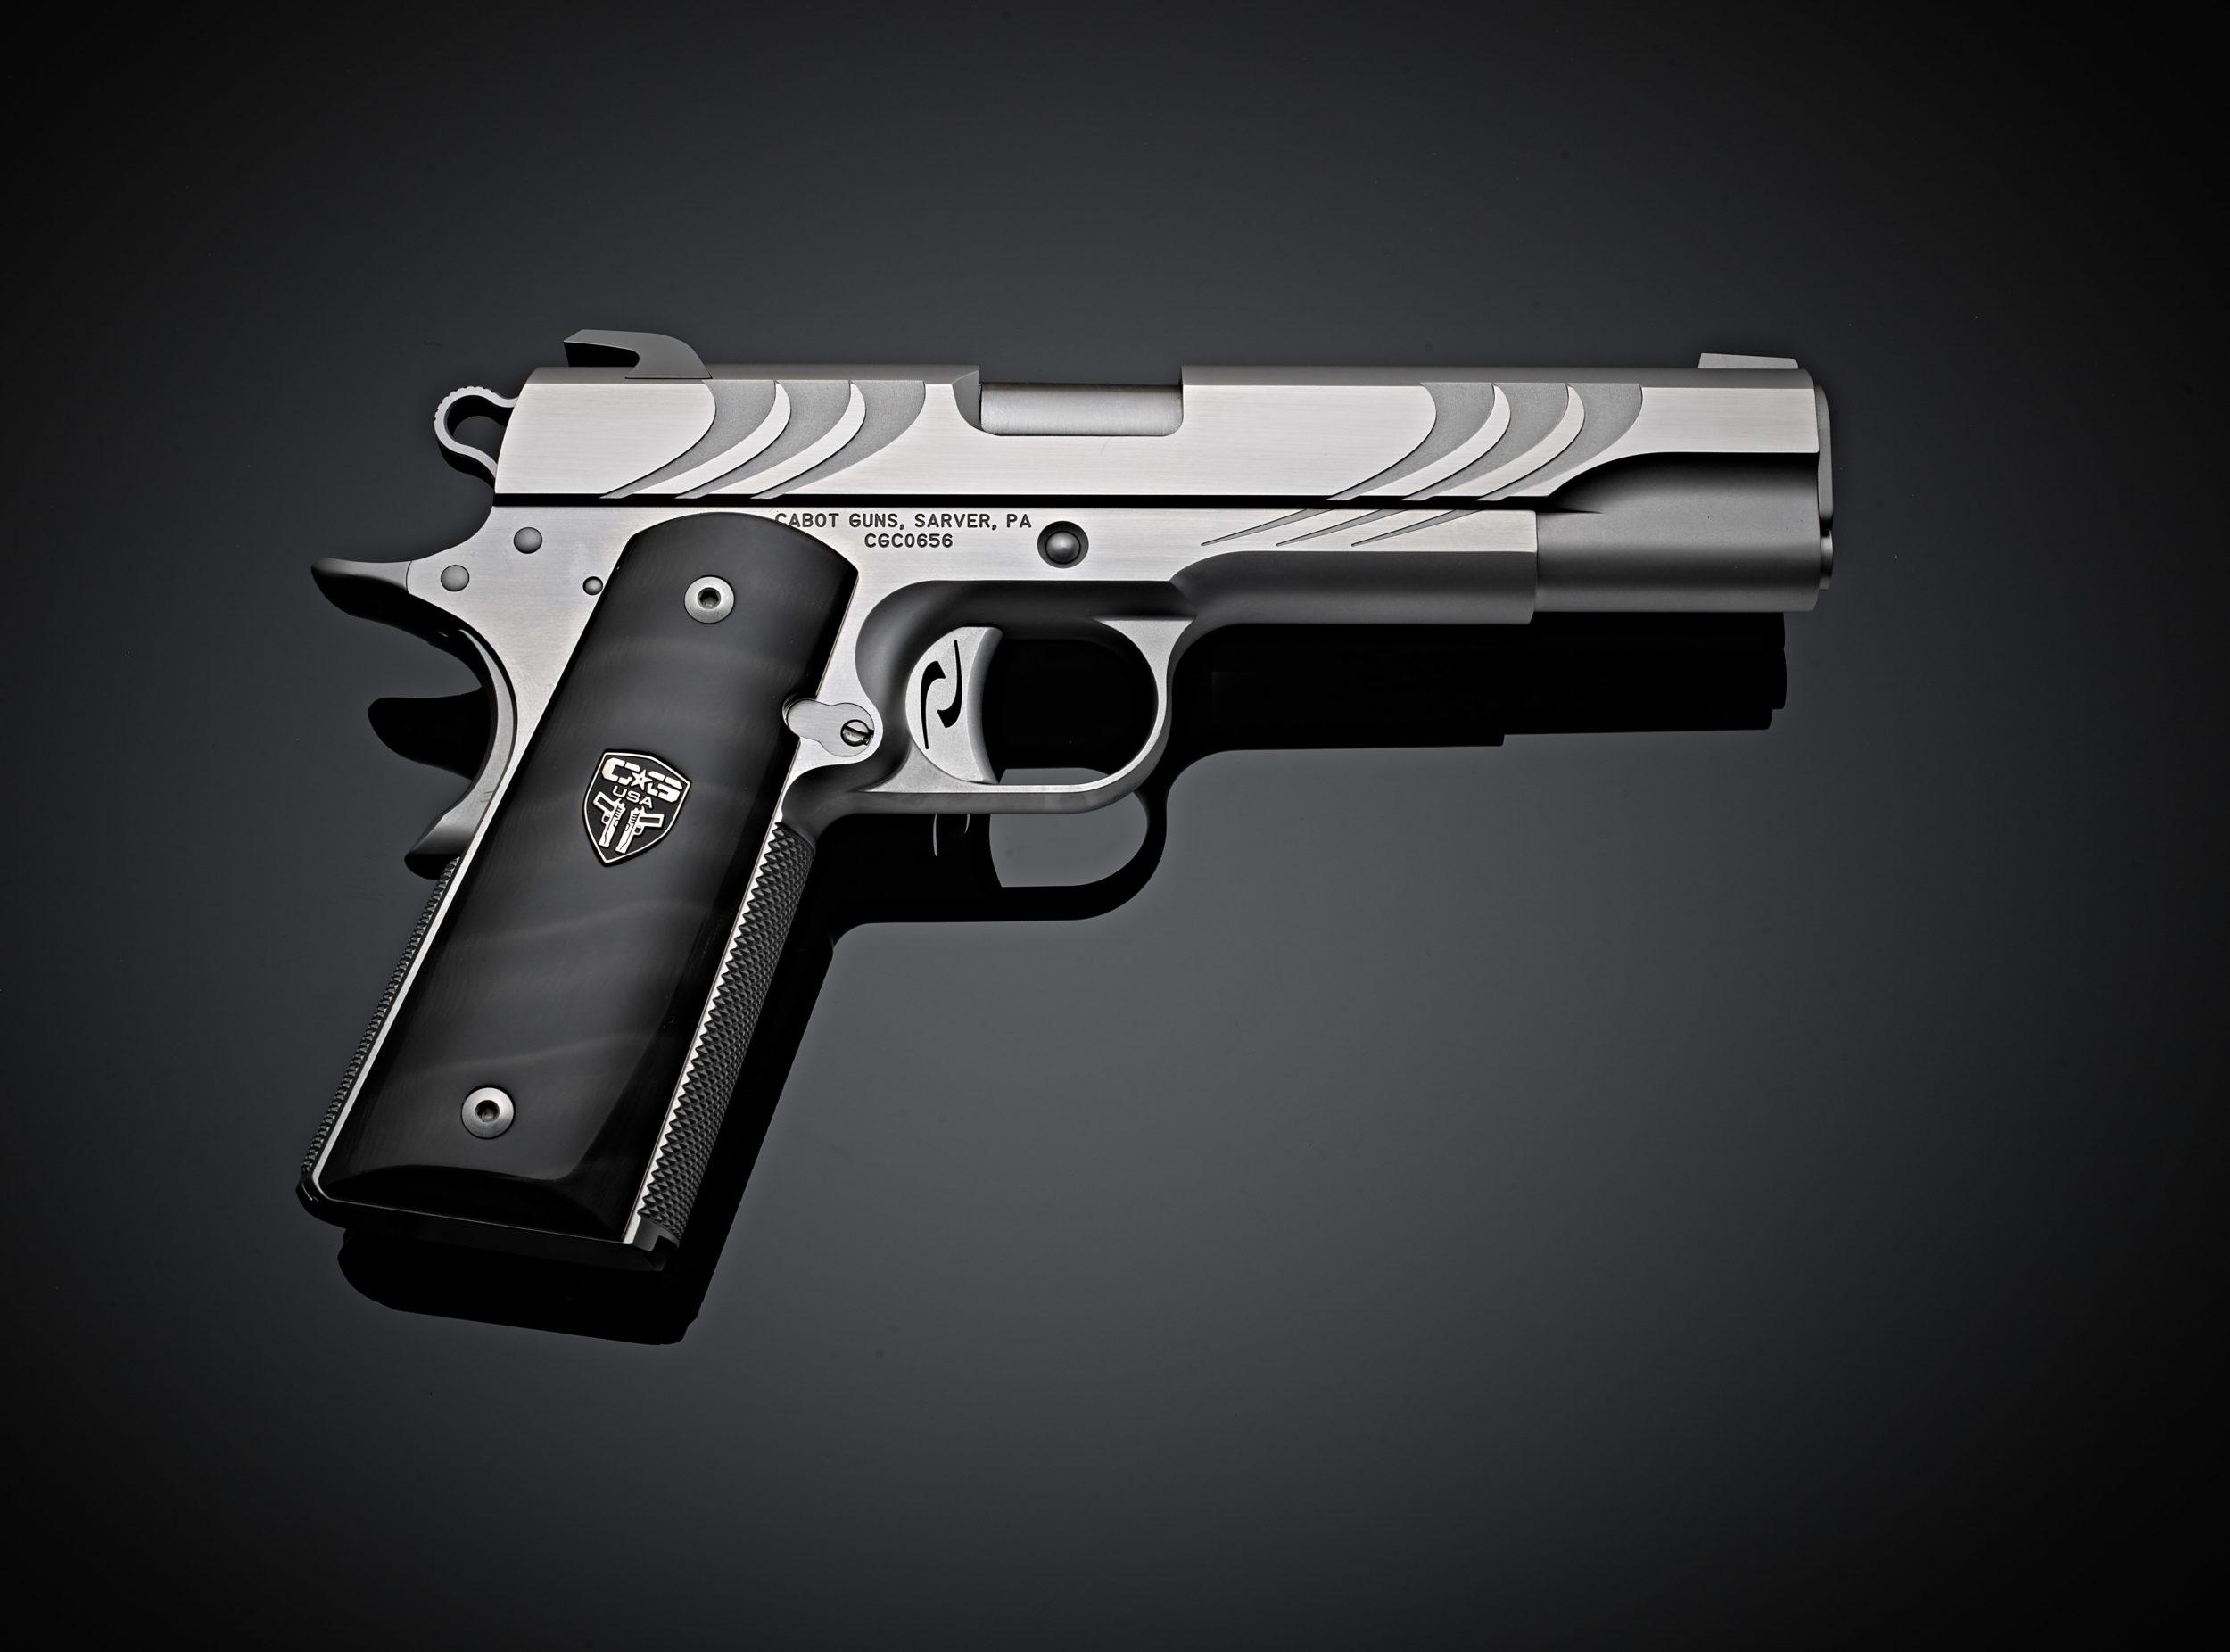 The Drako Garra 2 0 – Cabot Guns